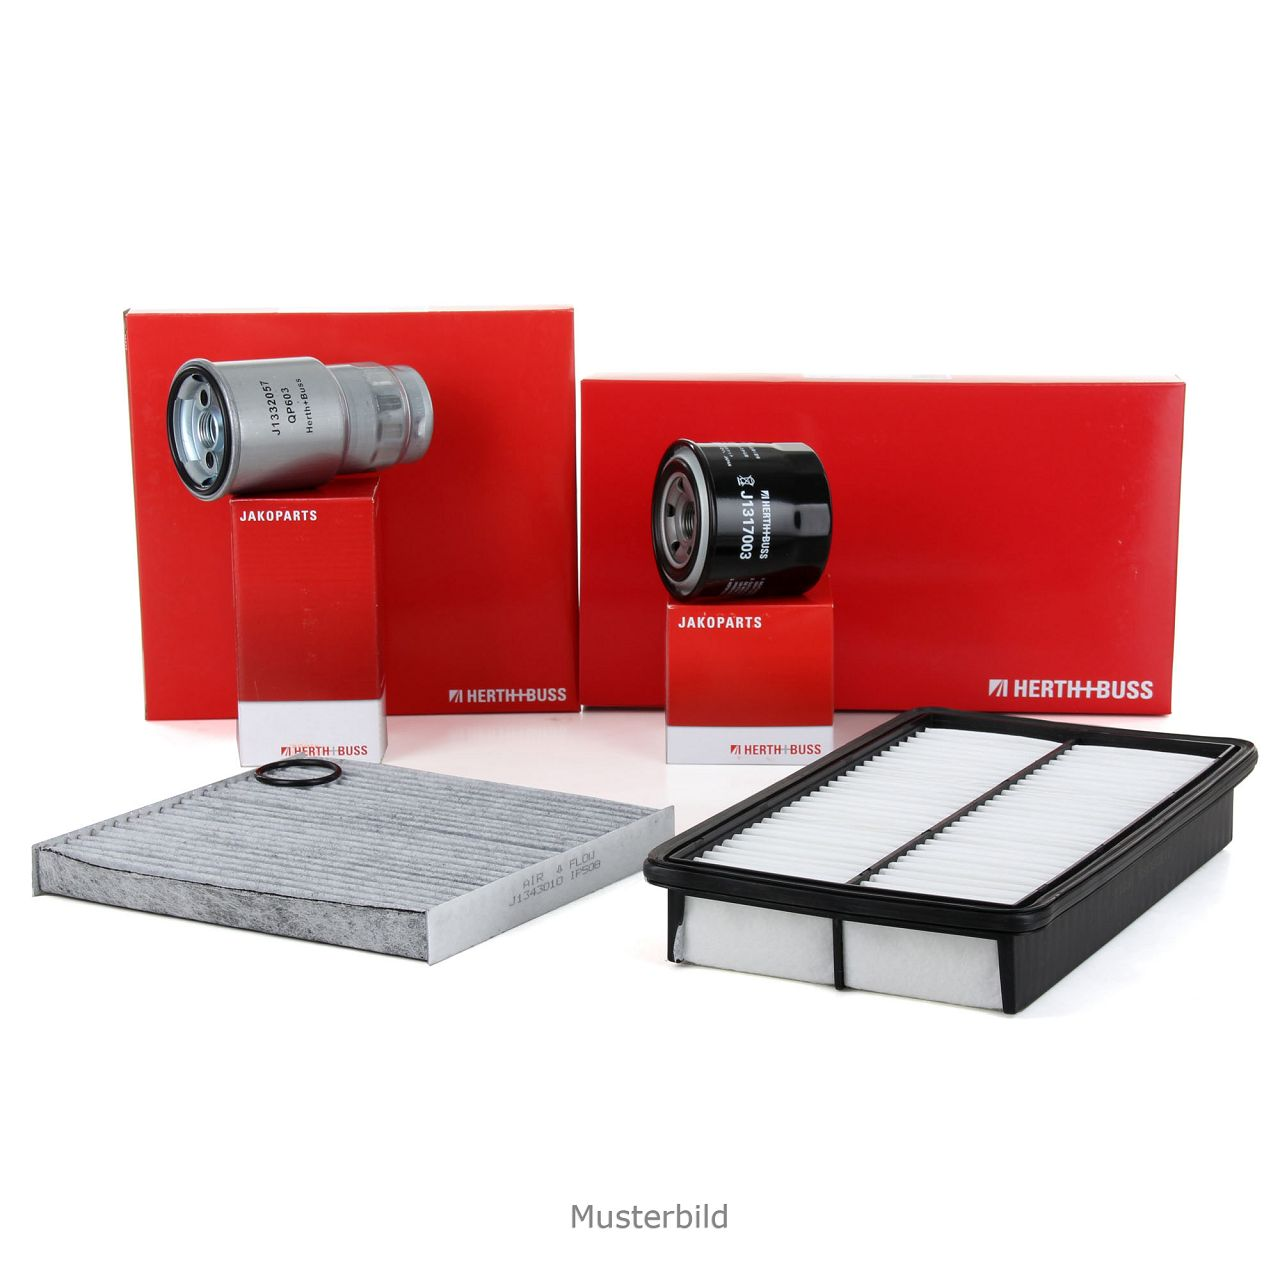 HERTH+BUSS JAKOPARTS Filterpaket Filterset für MITSUBISHI PAJERO III 3.5 203 PS